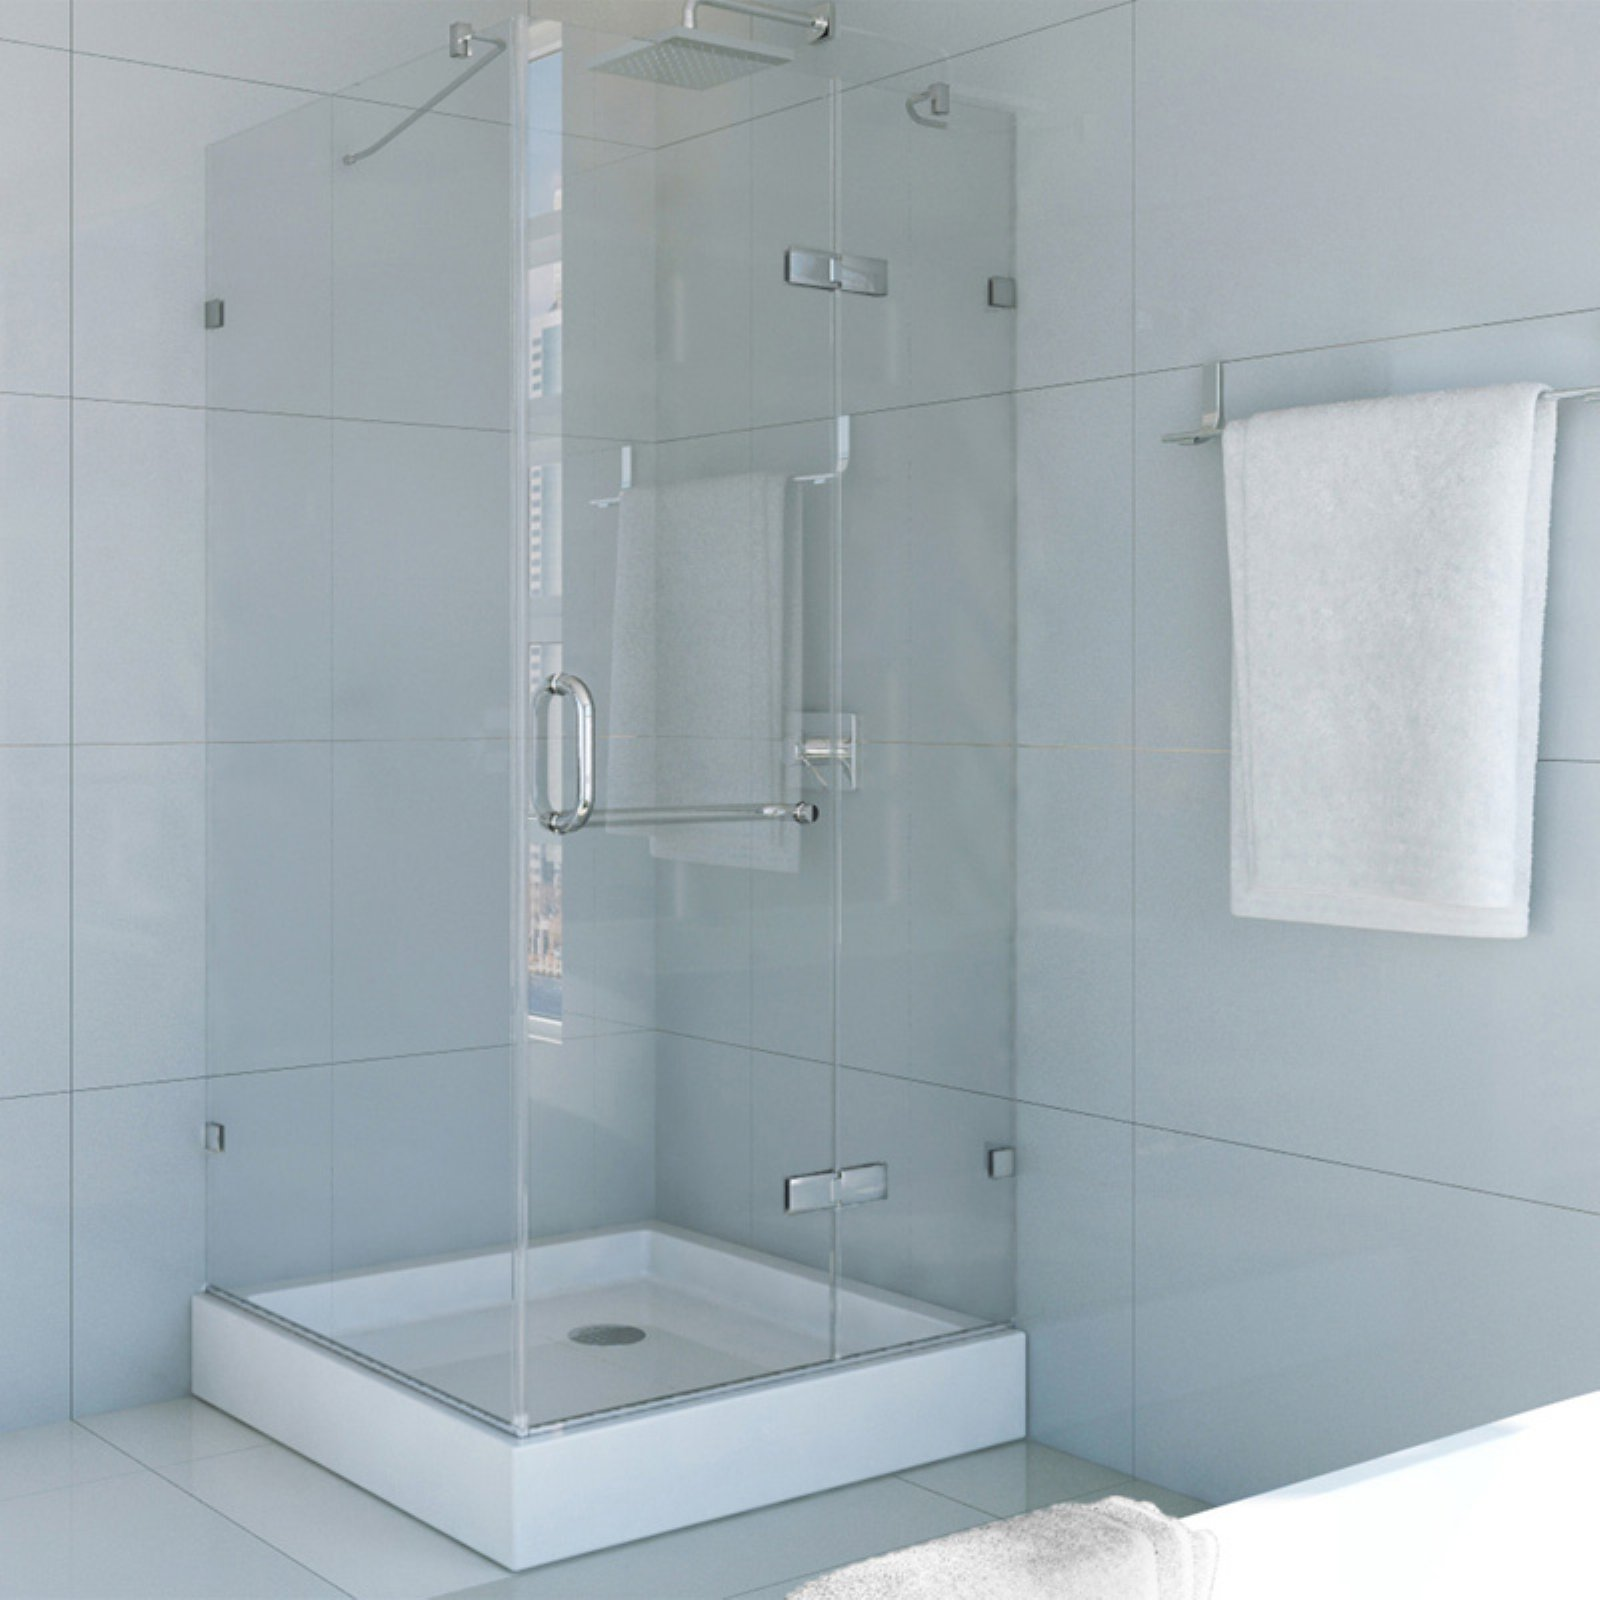 Vigo Vg6011363w 36 125w X 79 21h In Clear Glass Shower Enclosure With Base Shower Enclosure Shower Doors Glass Shower Enclosures